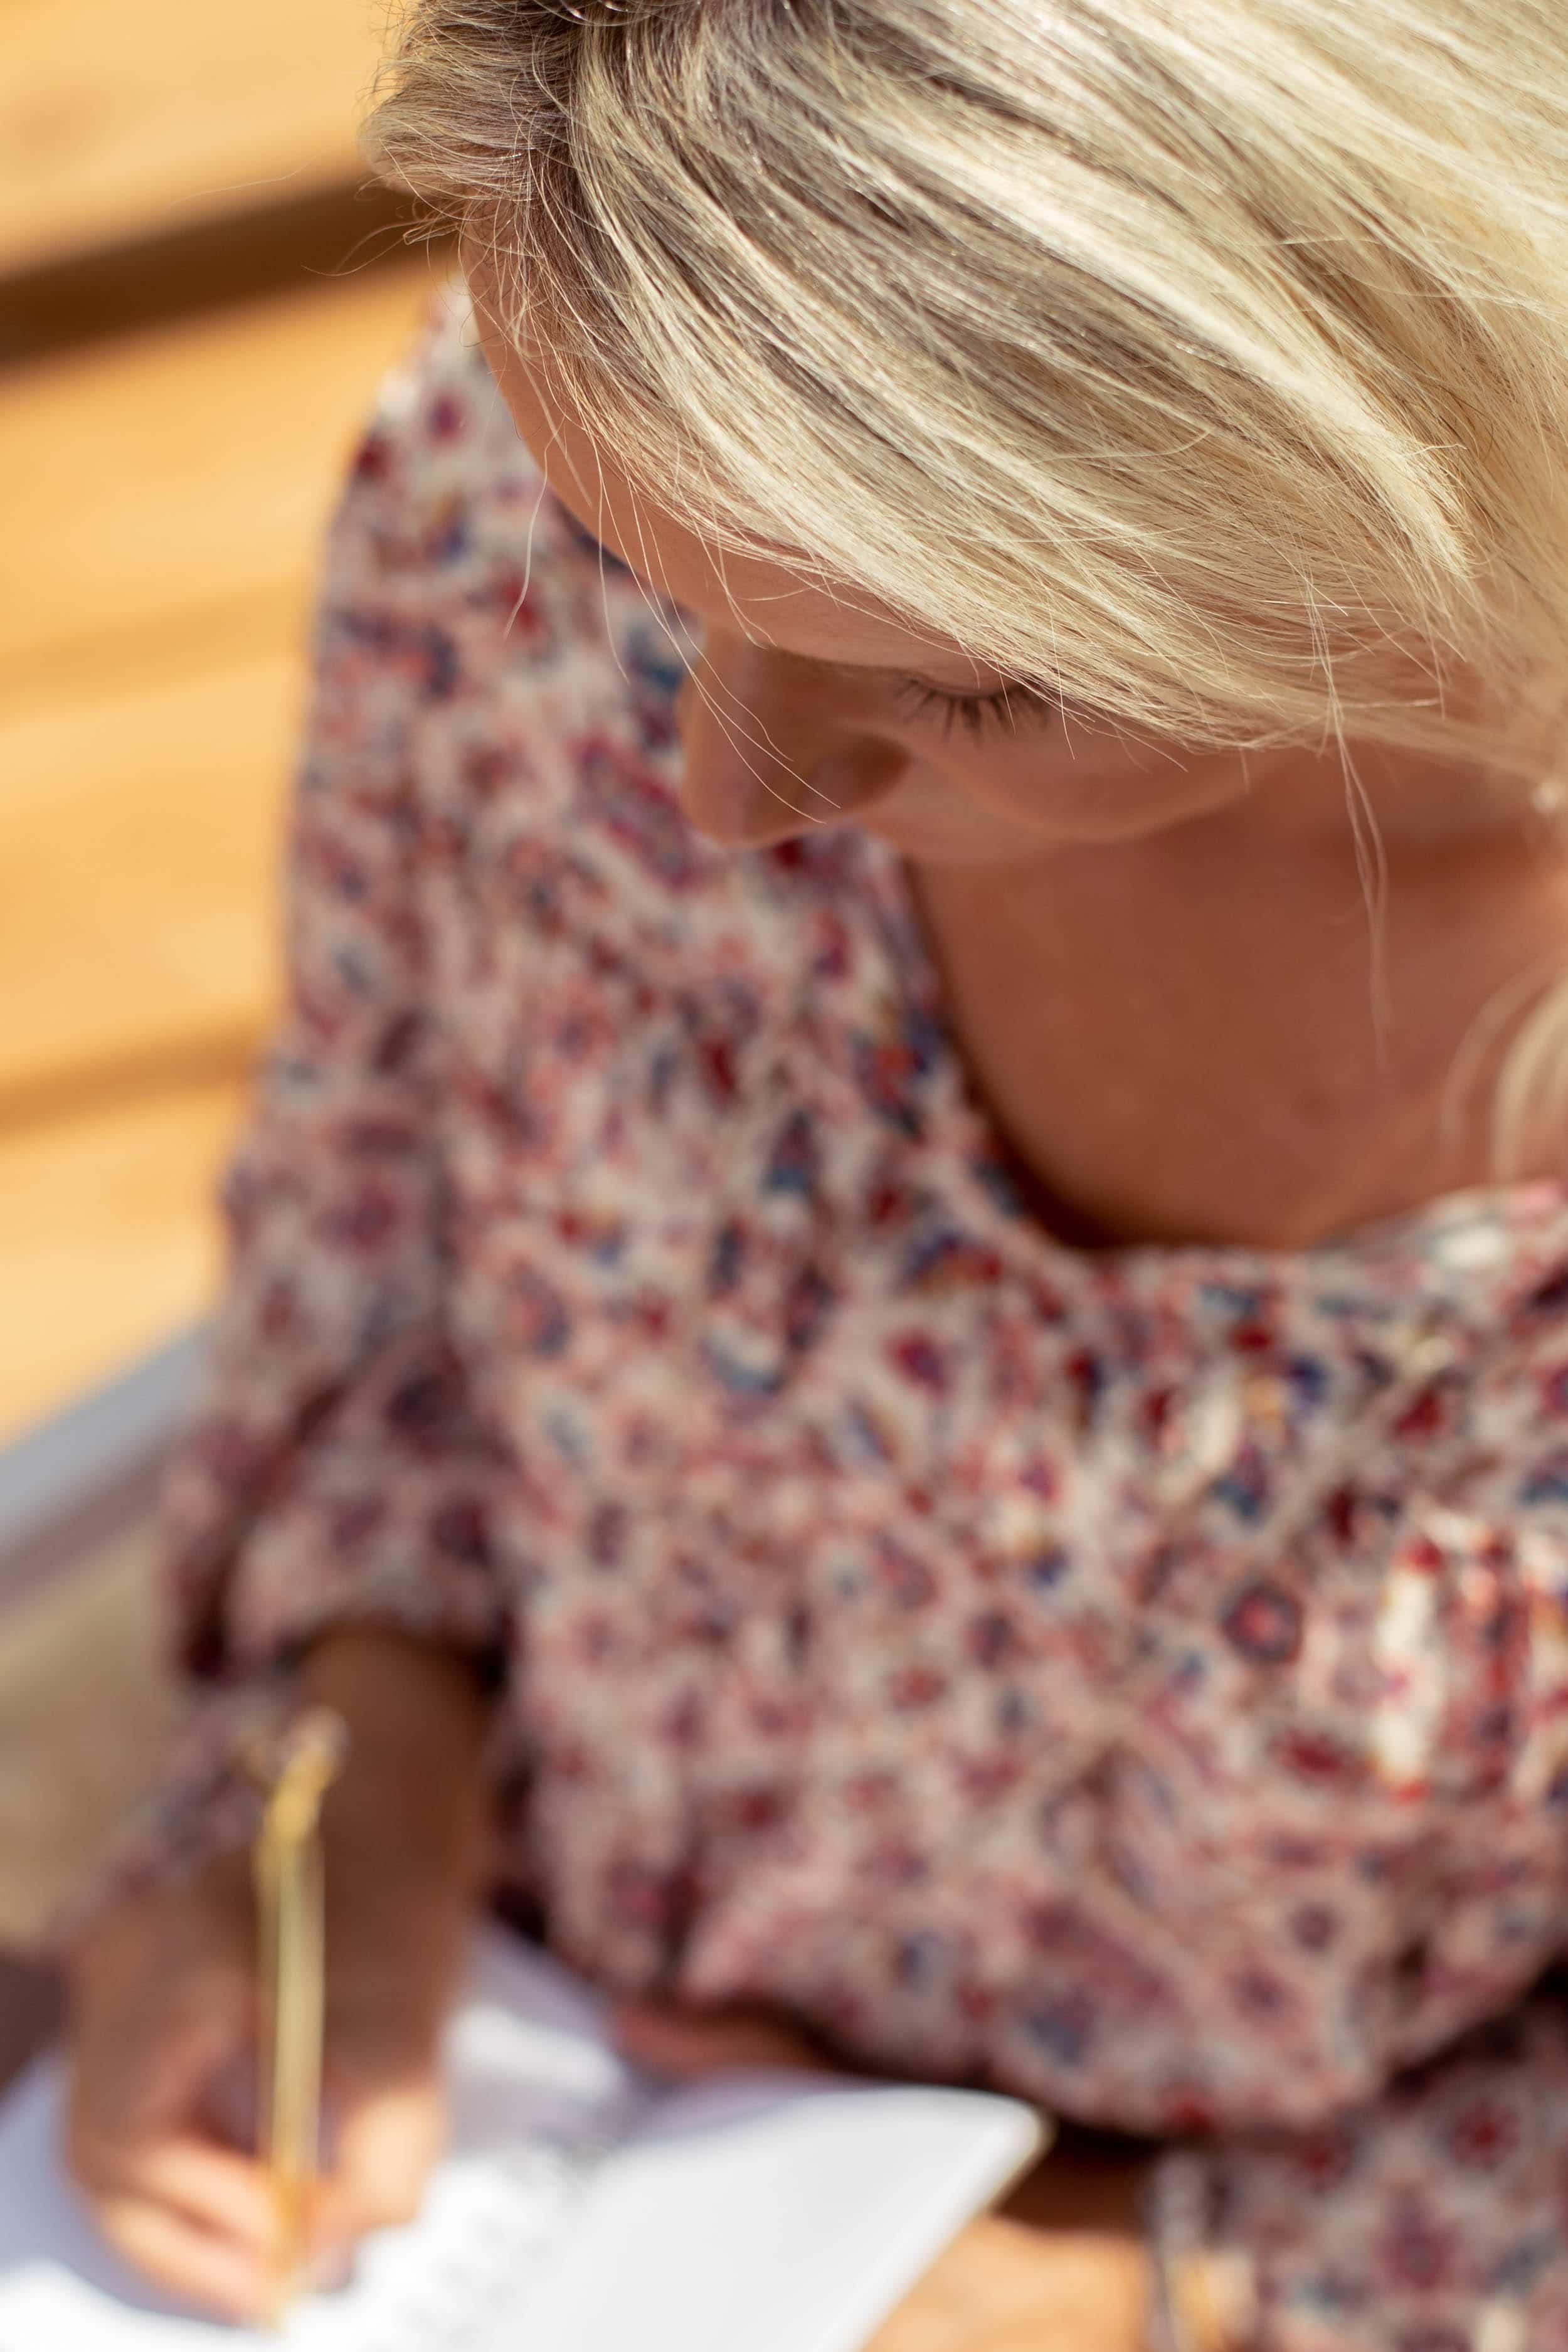 mindfulness Fyn - mindfulness Odense - mindfulness Svendborg - mindfulness Rudkøbing - mindfulness Tranekær - mindfulness Langeland